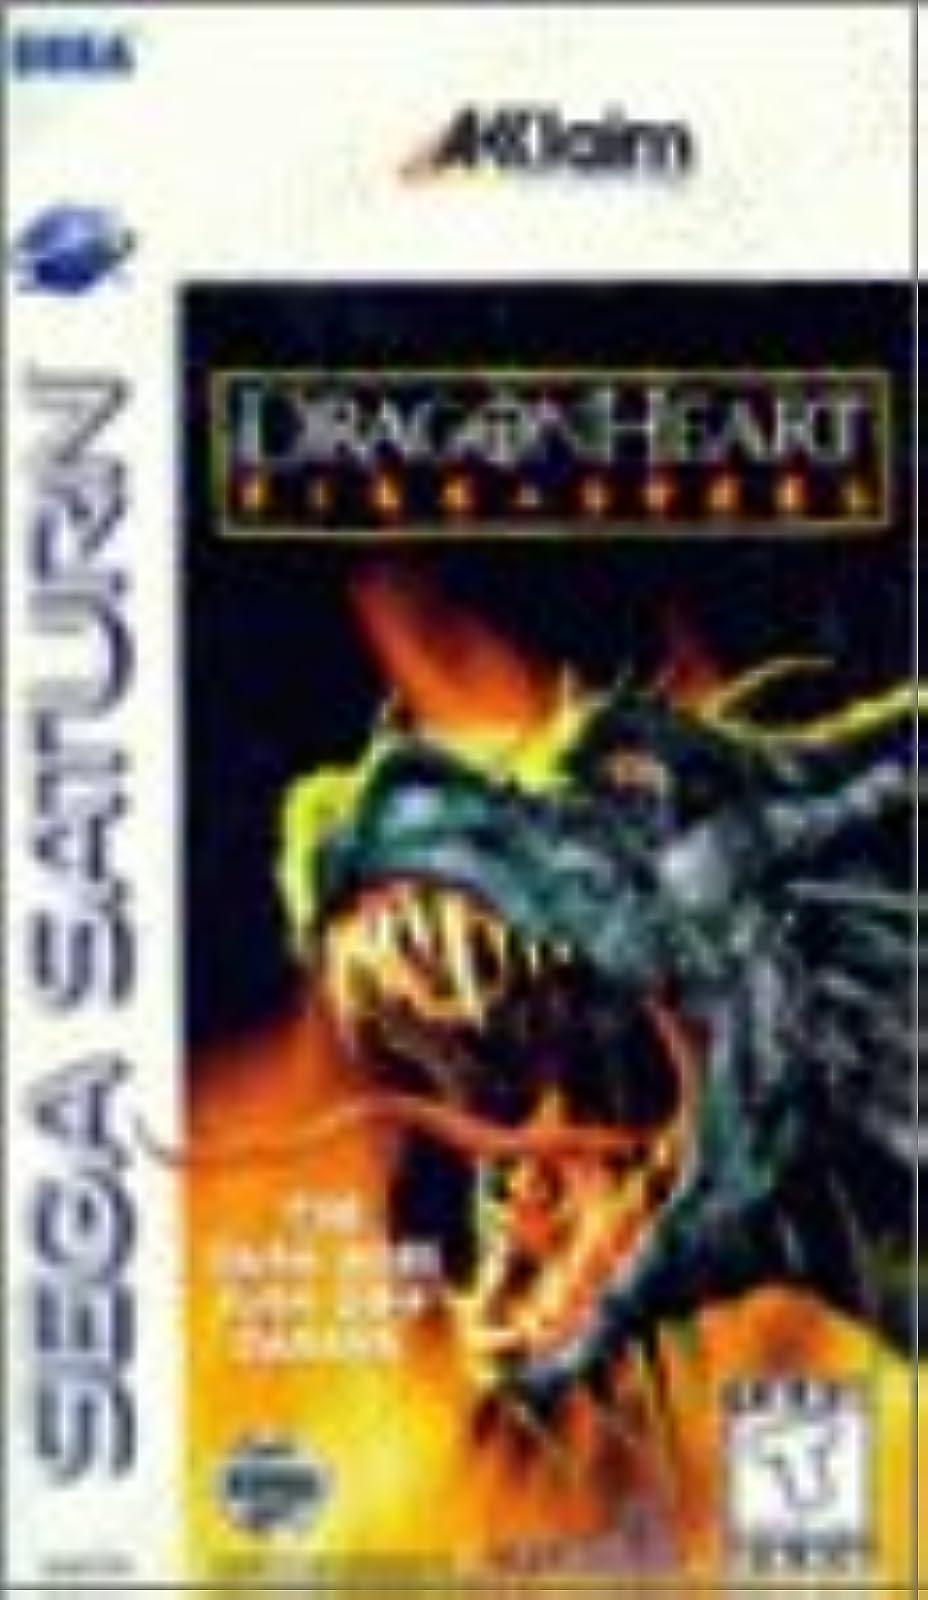 Dragonheart: Fire And Steel Sega Saturn 1996 For Sega Saturn Vintage